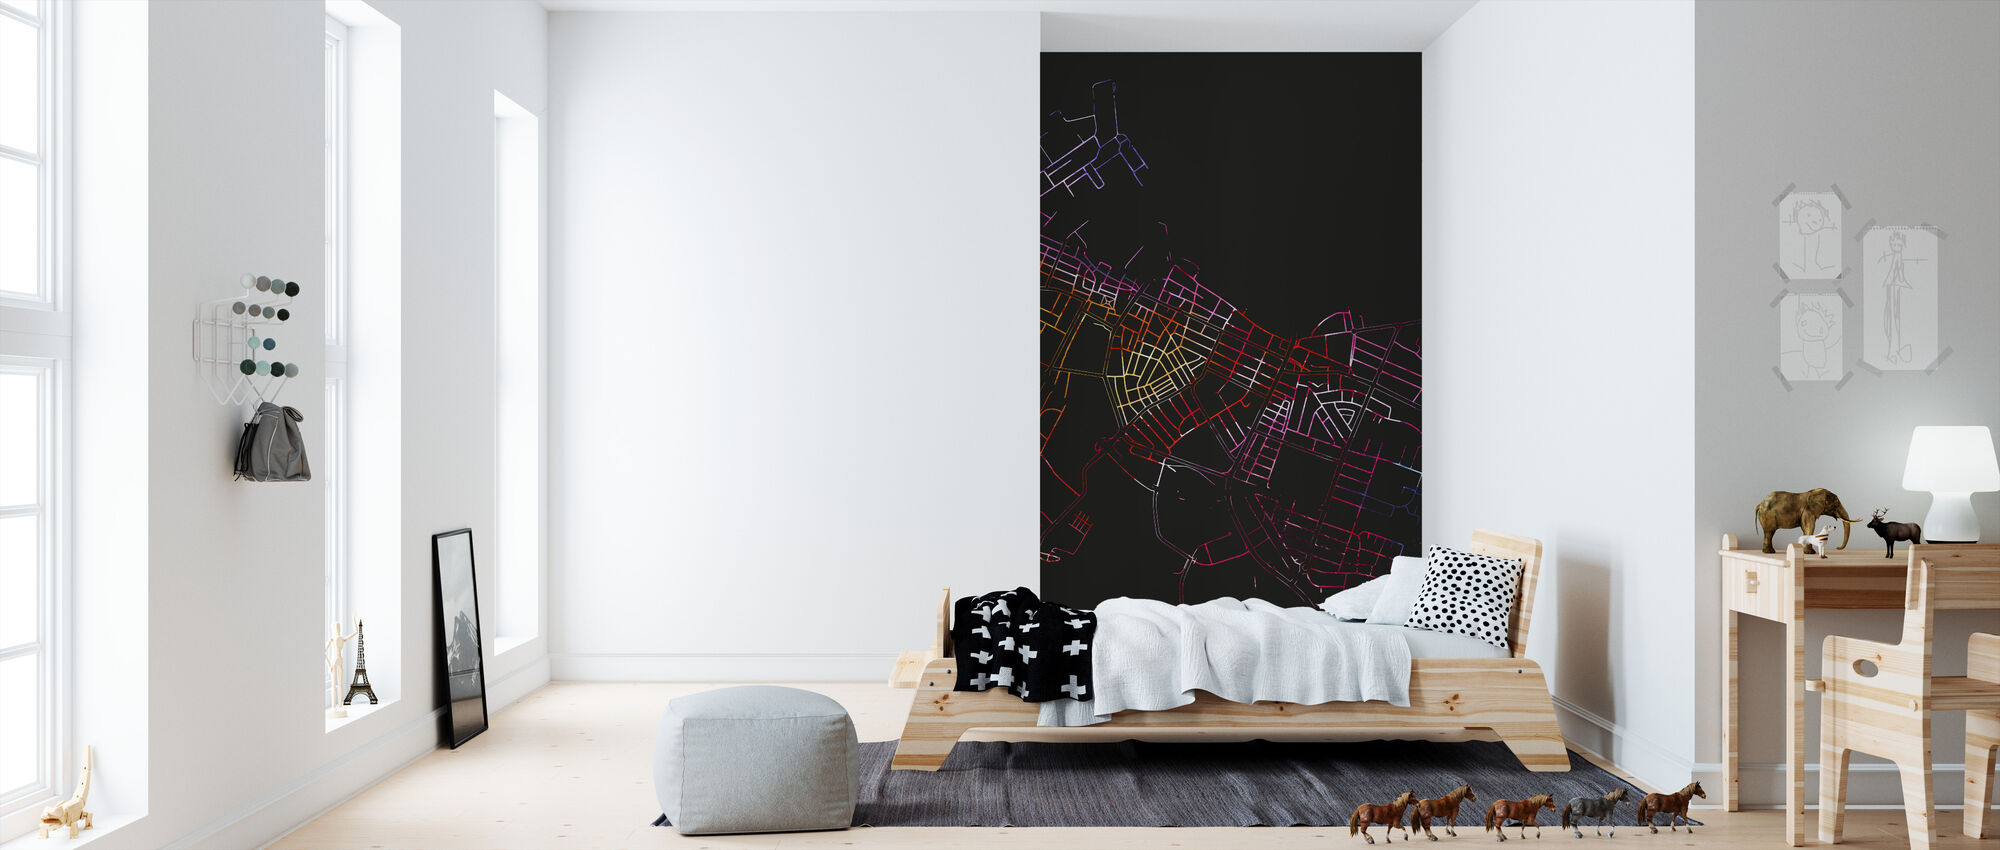 Reykjavik in Iceland - Map - Wallpaper - Kids Room